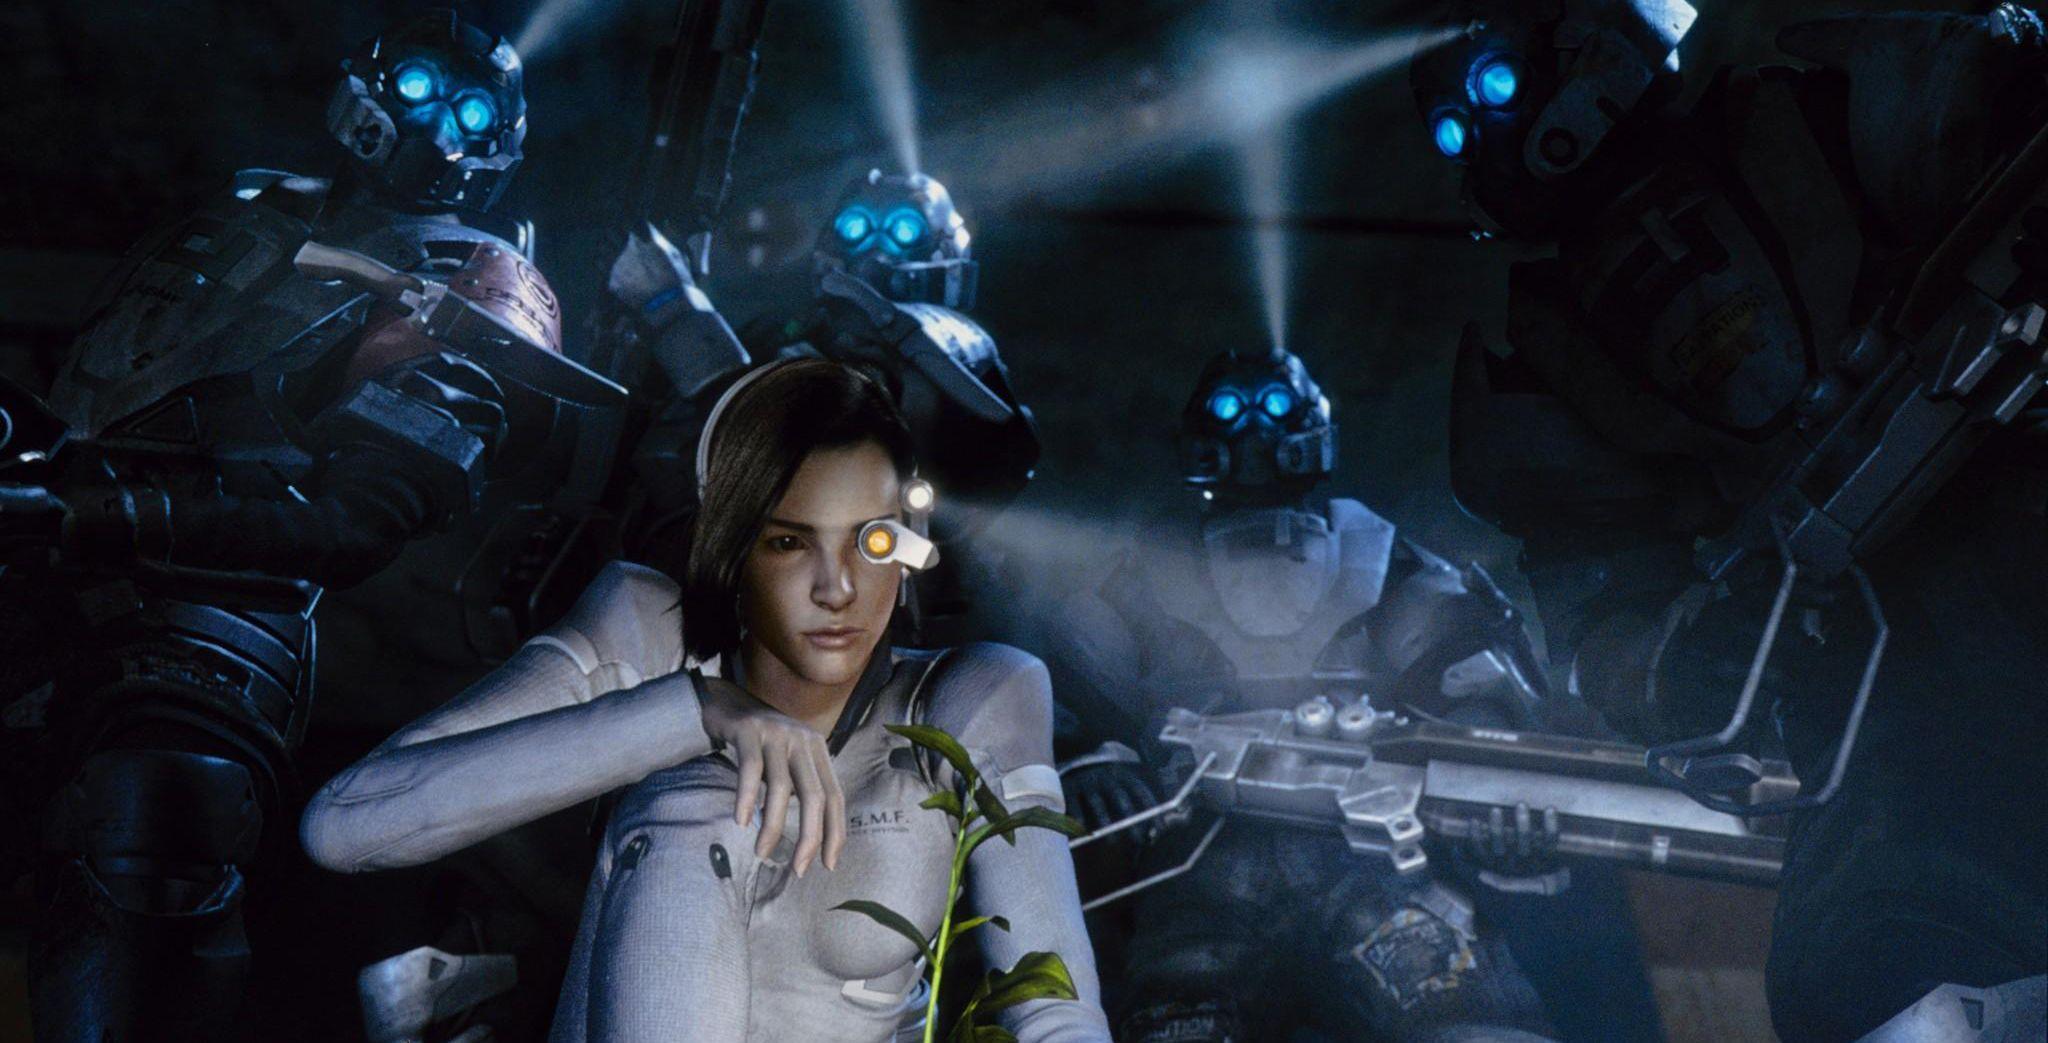 Final Fantasy: The Spirits Within screenshot